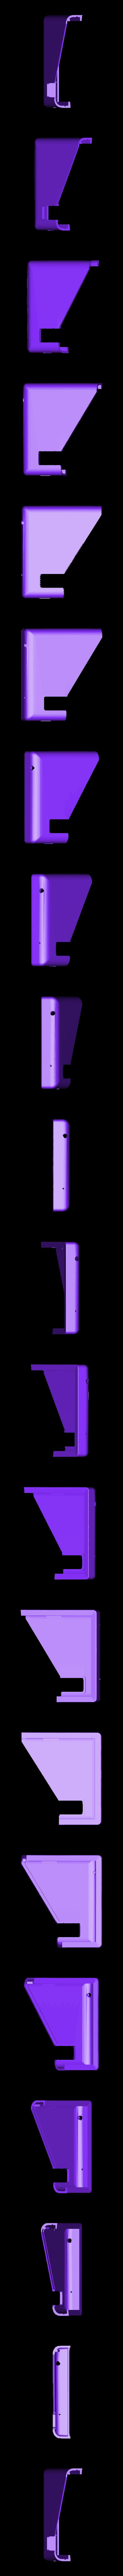 cova114_oben.stl Download free STL file Fairphone 2 cover • 3D printer model, unwohlpol